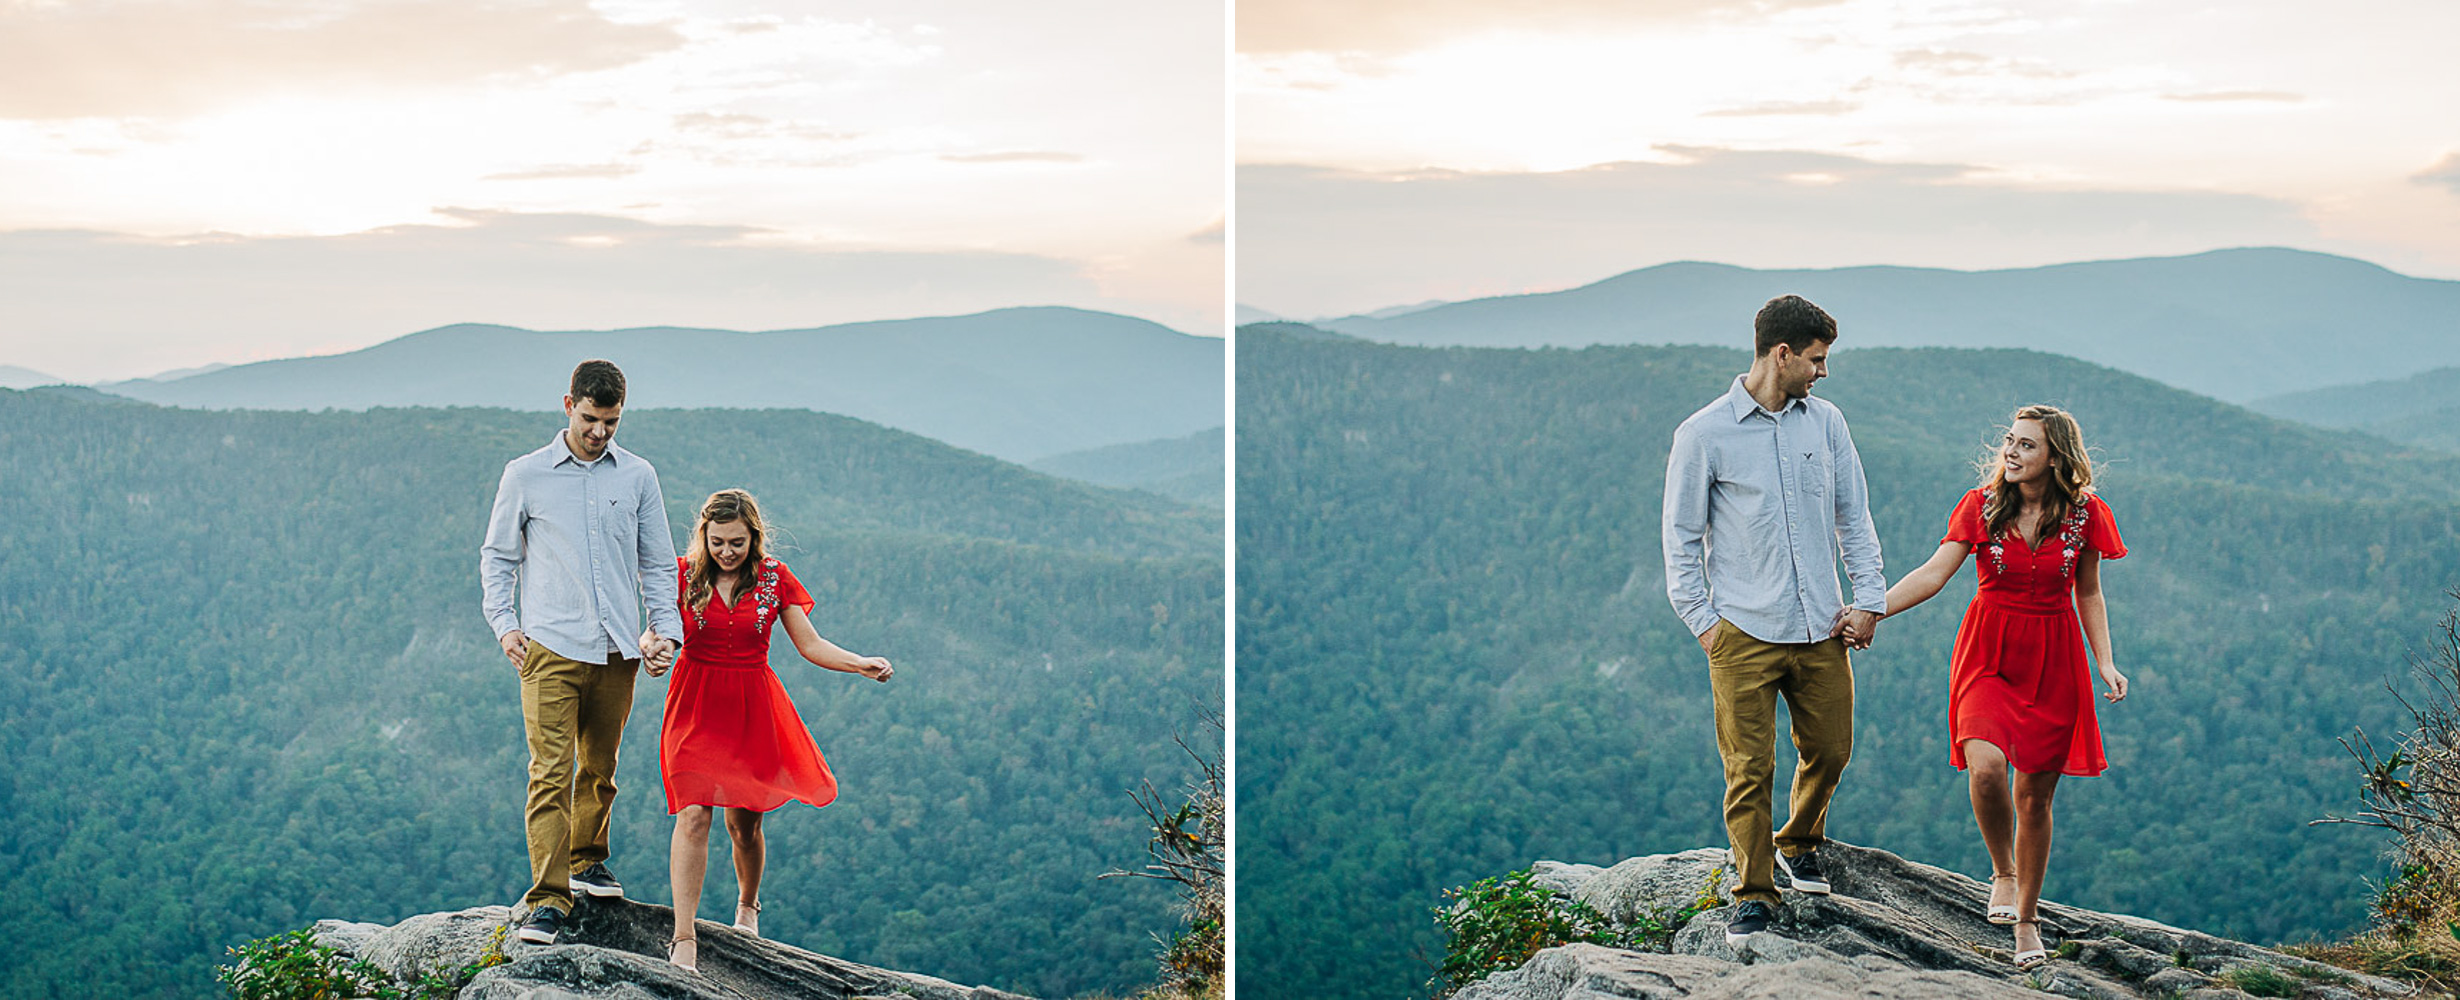 Engagement Portraits 18.jpg